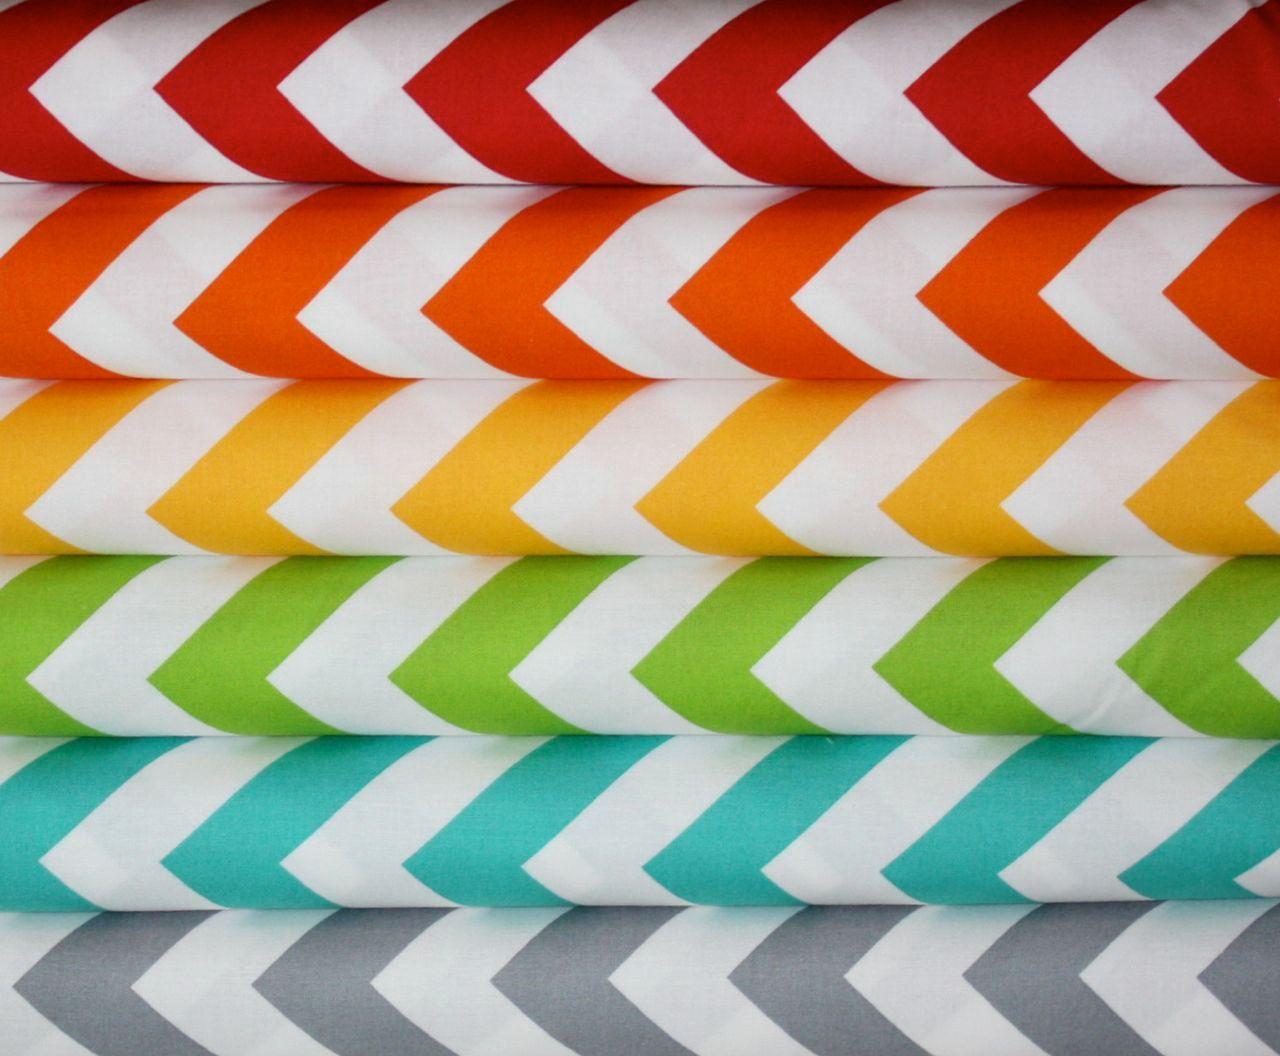 Chevron Fabric Bundle By Moda 1 2 Yard Bundle Chevron Fabric Fabric Chevron Sheets